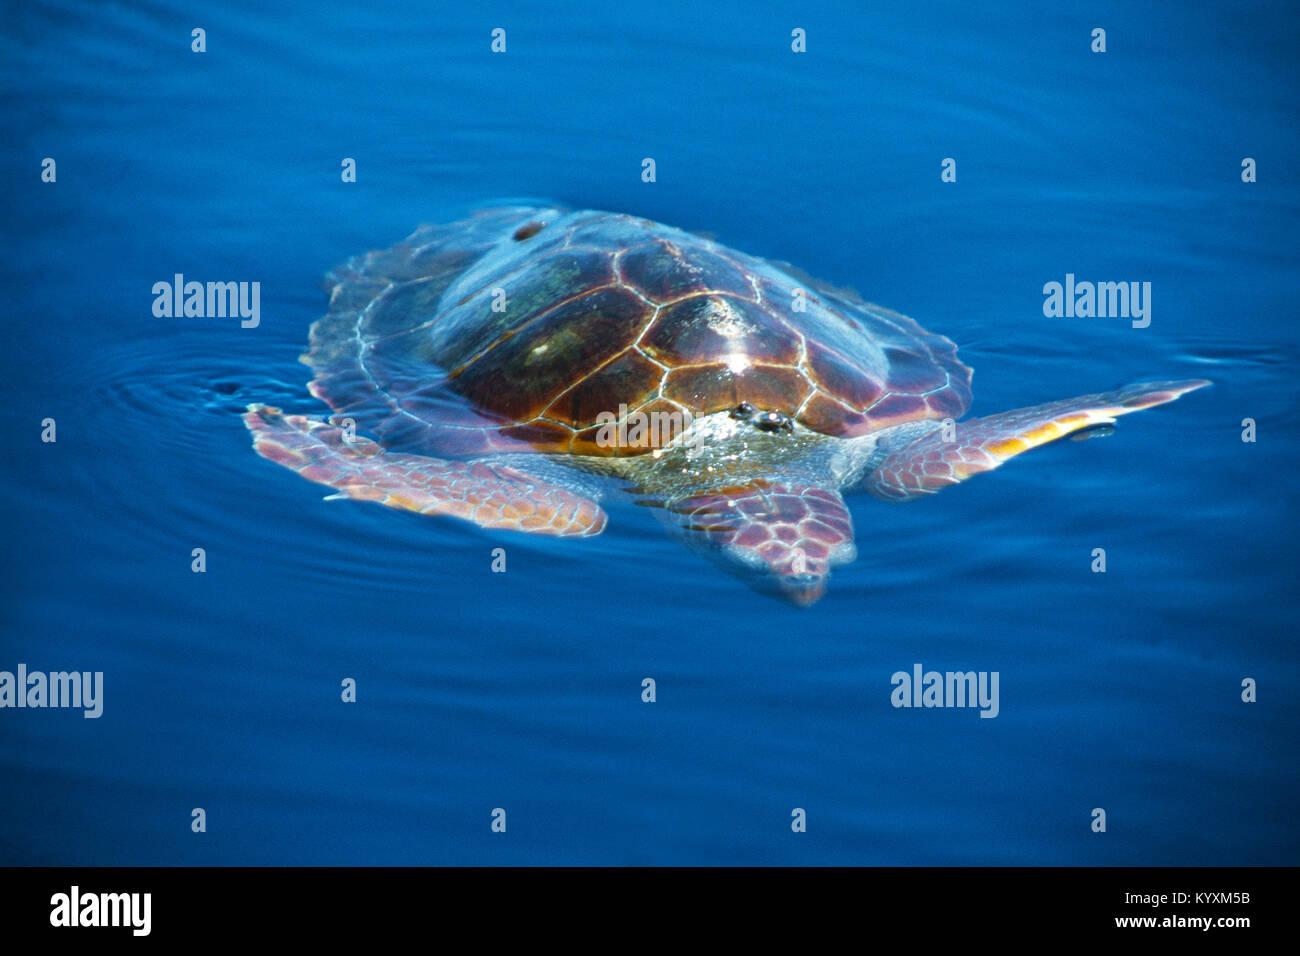 Loggerhead seaturtle (Caretta caretta) on surface at open sea, Acores, Portugal, Atlantic ocean Stock Photo